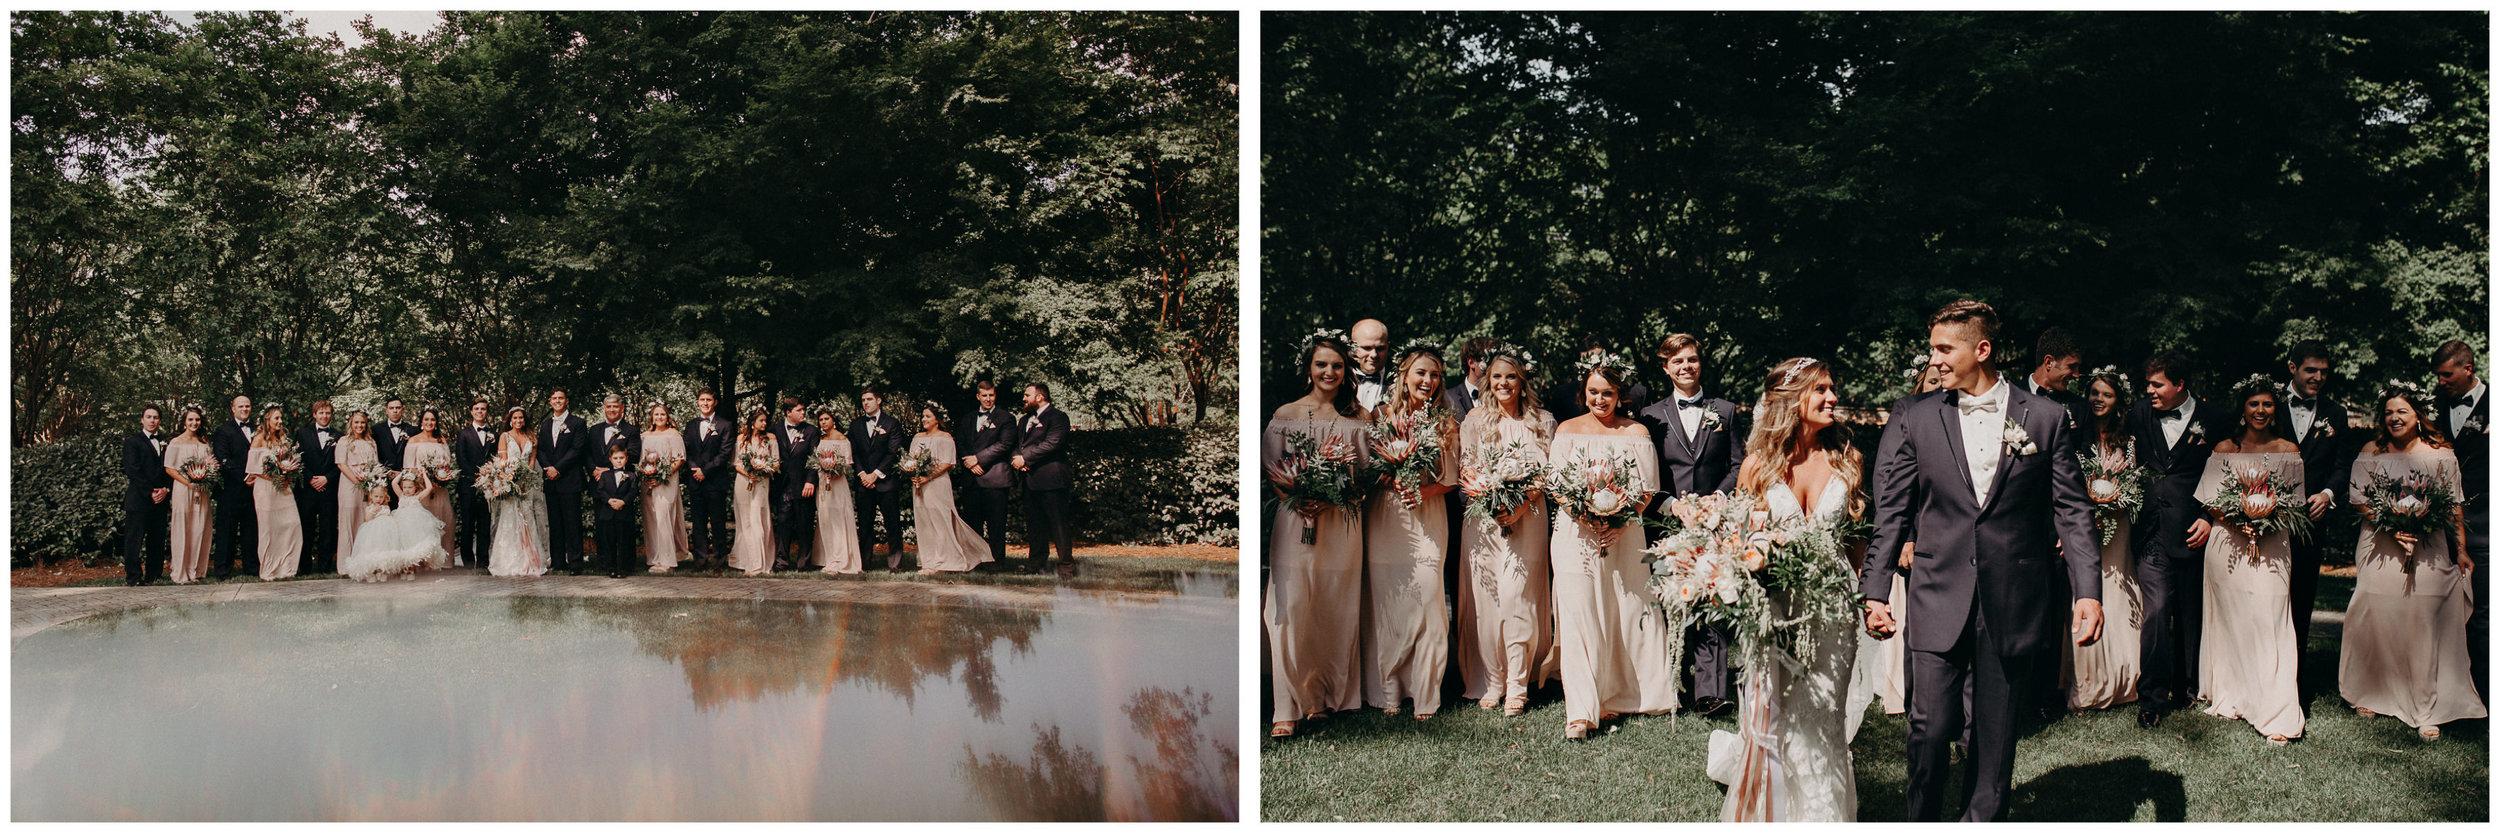 43Carl House Wedding Venue Ga, Atlanta Wedding Photographer - Boho, Bohemian, Junebug Weddings, Vintage, Retro, Trendy. Aline Marin Photography. .jpg